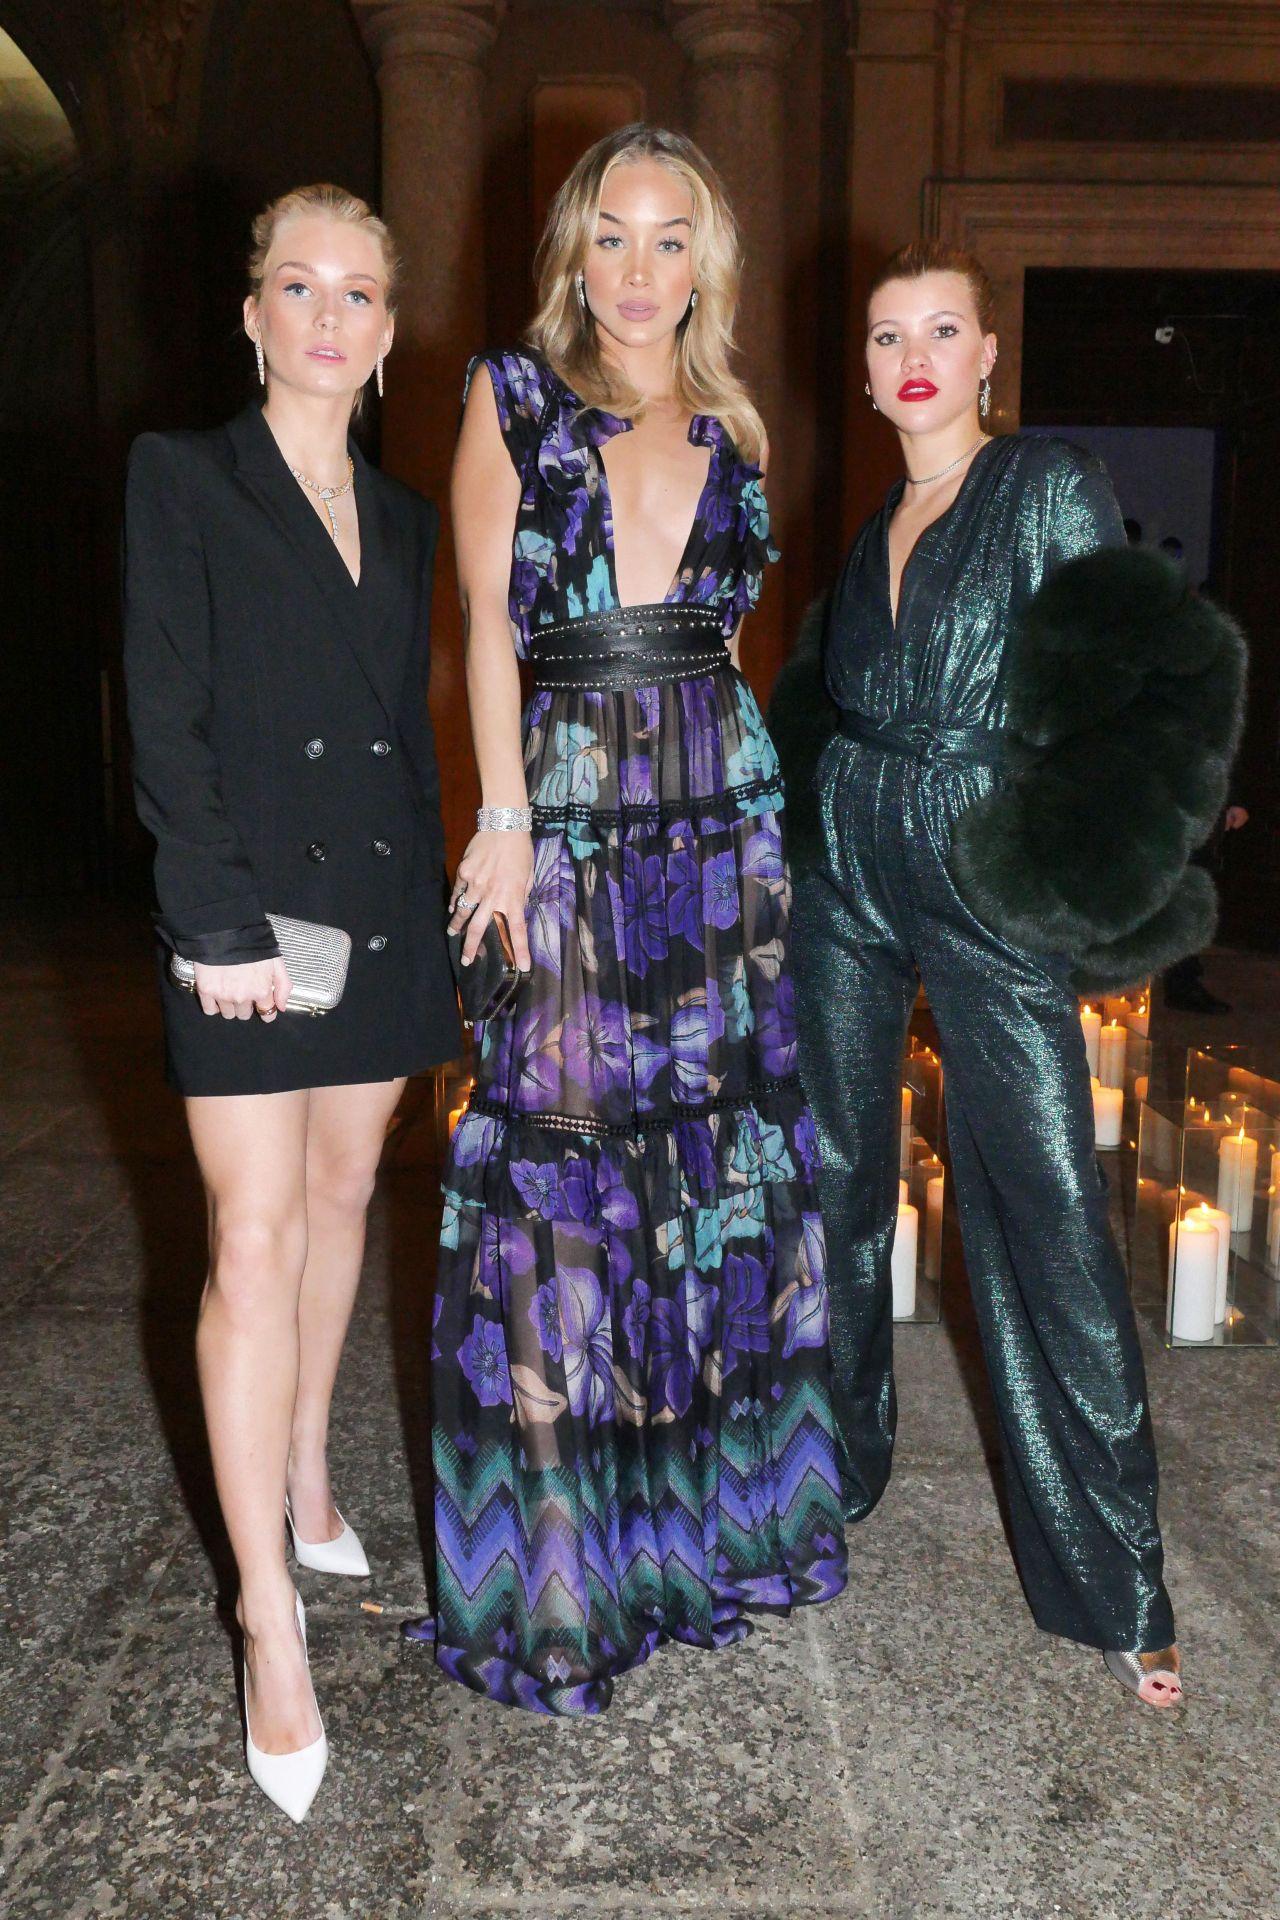 Lottie Moss, Jasmine Sanders & Sofia Richie – Vogue Italia and Place Vendome Party in Milan 2/24/ 2017